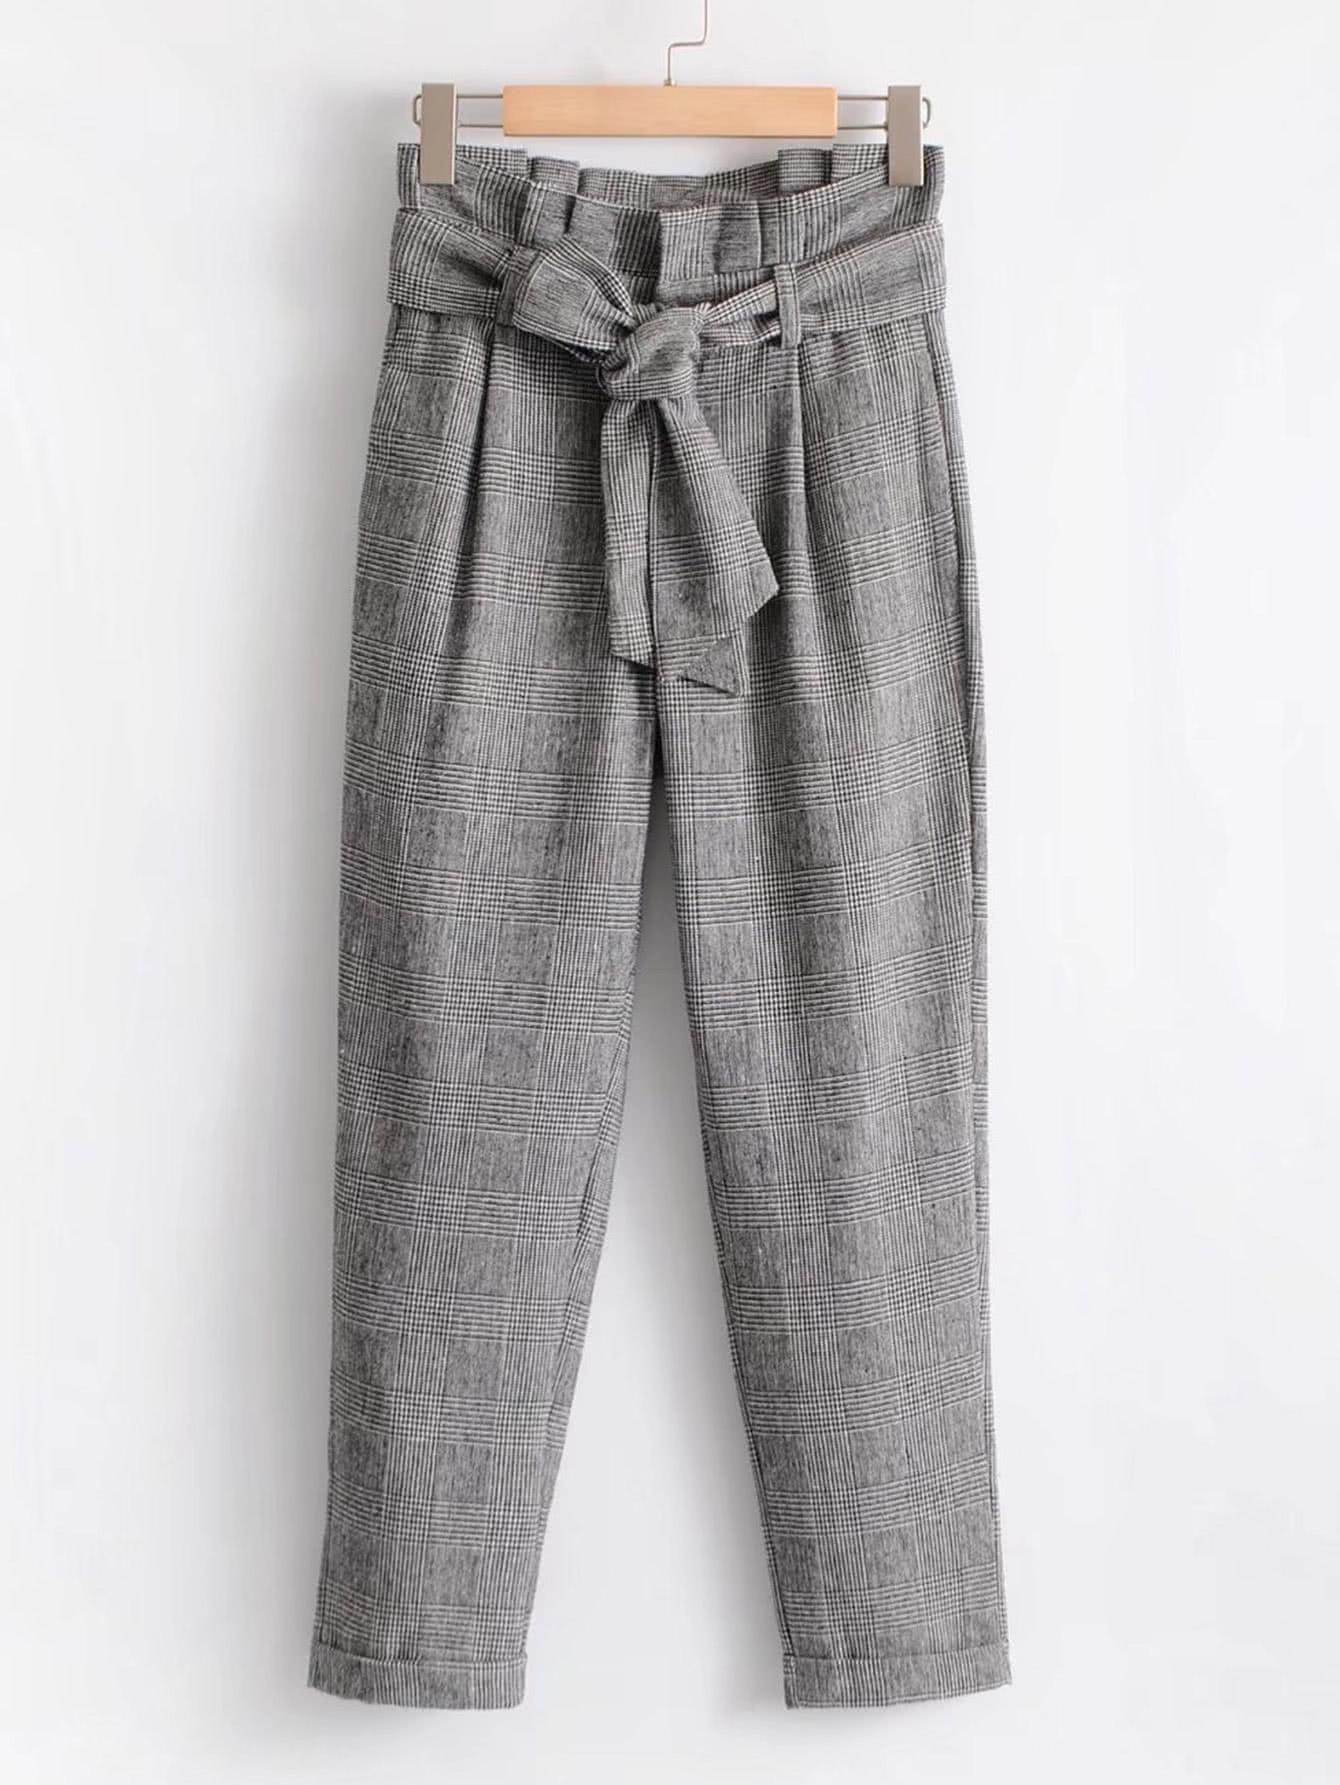 Frill Waist Self Tie Plaid Pants striped ruffled waist self tie pants